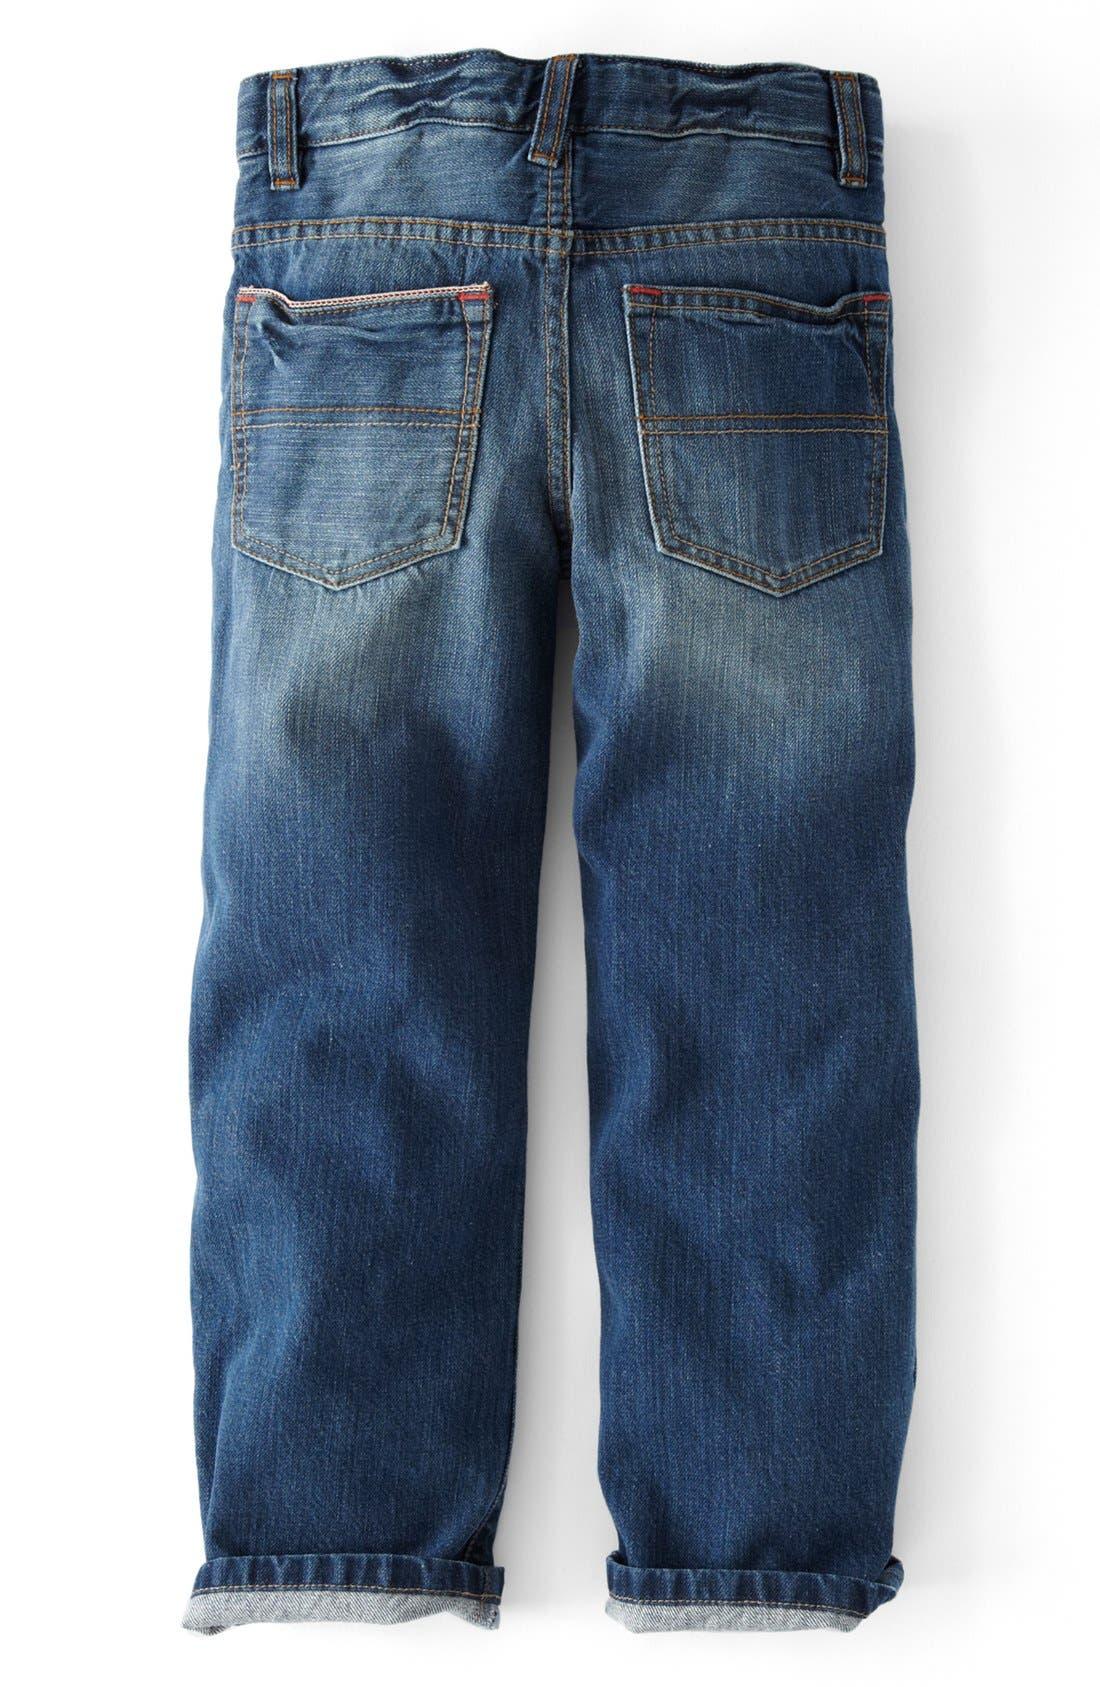 Alternate Image 2  - Mini Boden Vintage Jeans (Toddler Boys, Little Boys & Big Boy)